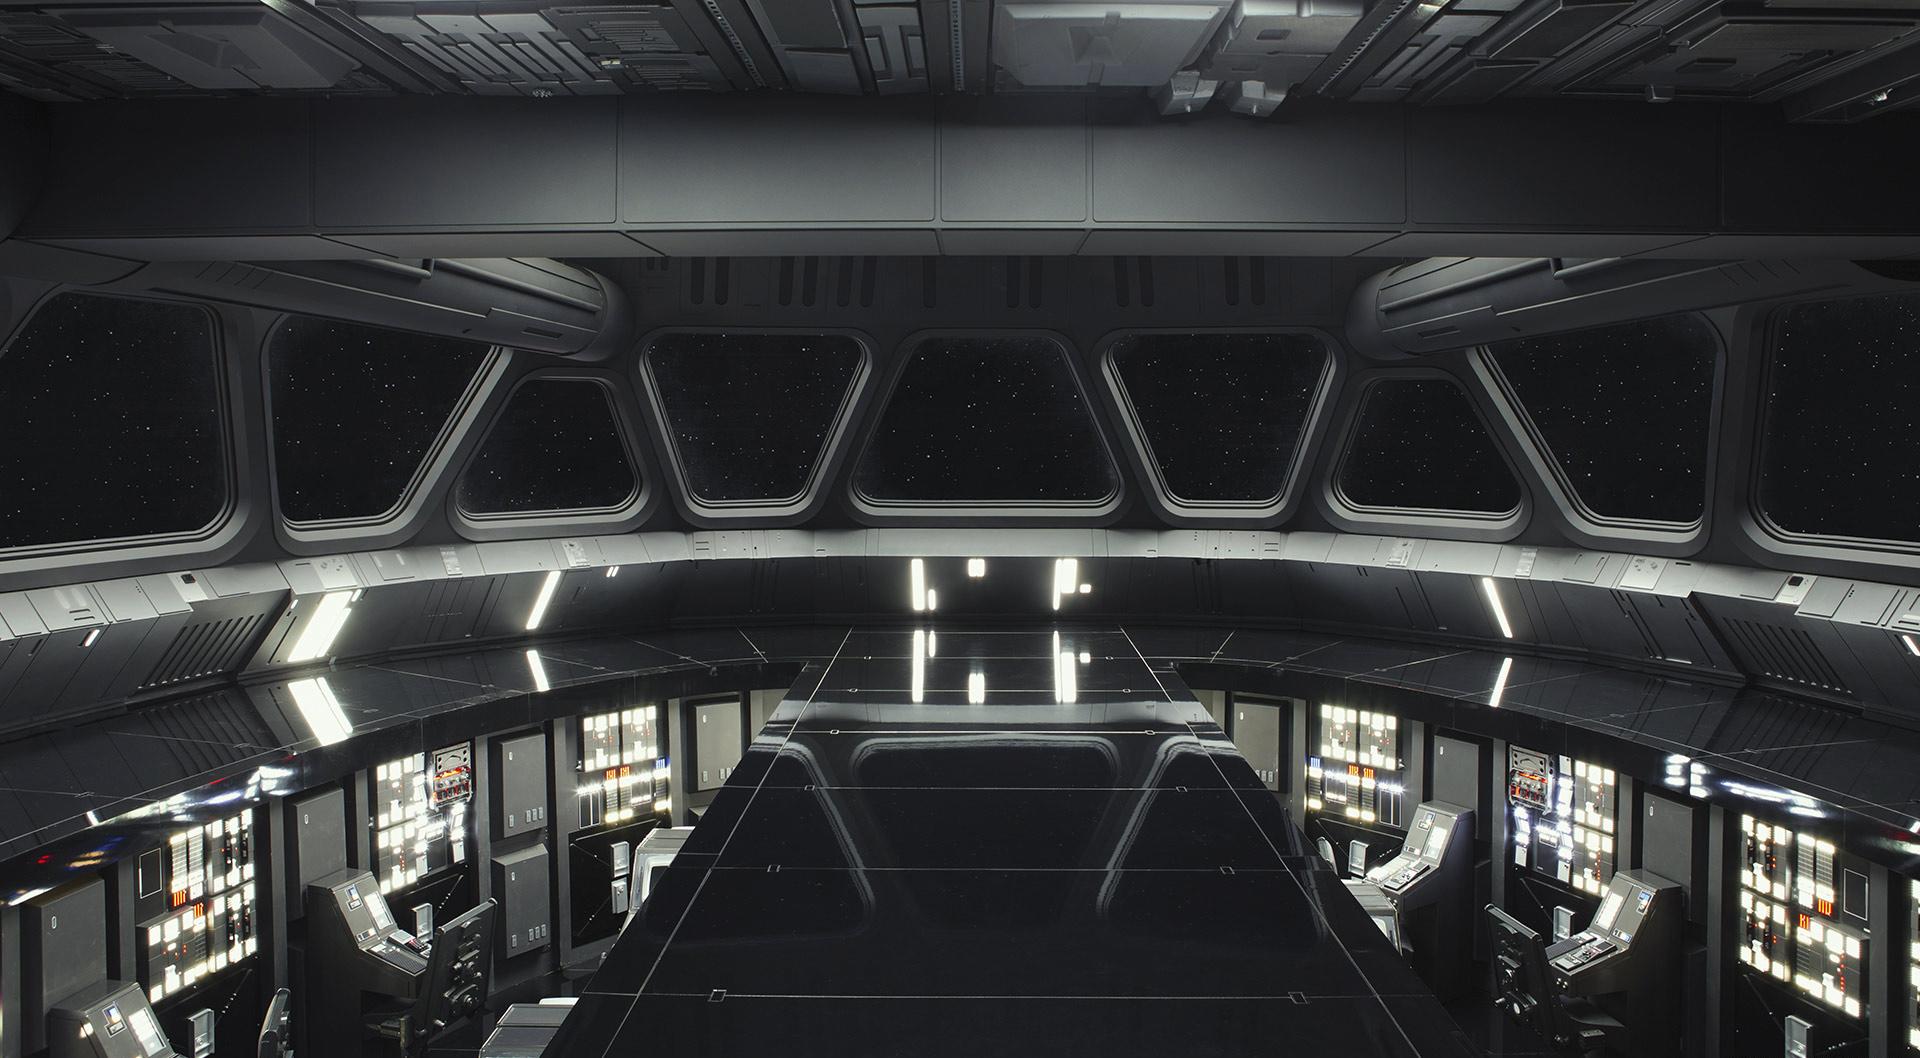 Bridge (starship)